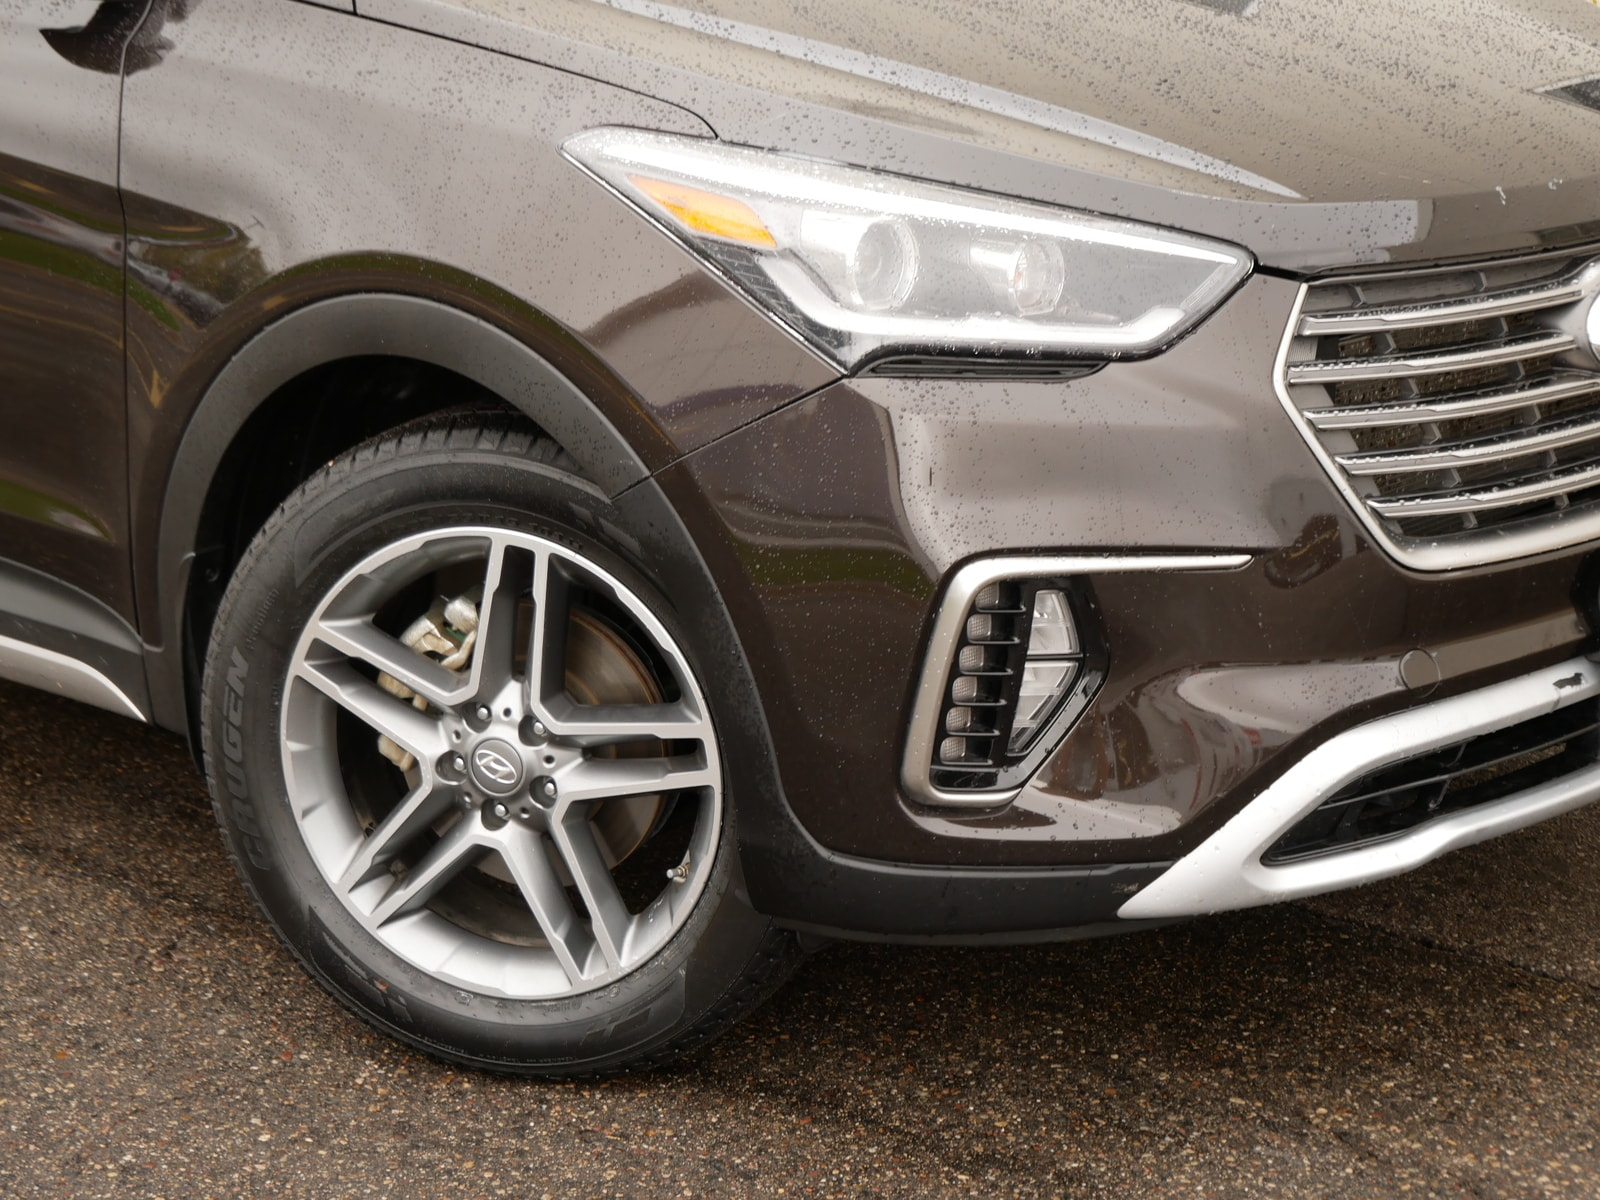 Certified 2019 Hyundai Santa Fe Limited Ultimate with VIN KM8SRDHFXKU303342 for sale in Saint Paul, Minnesota